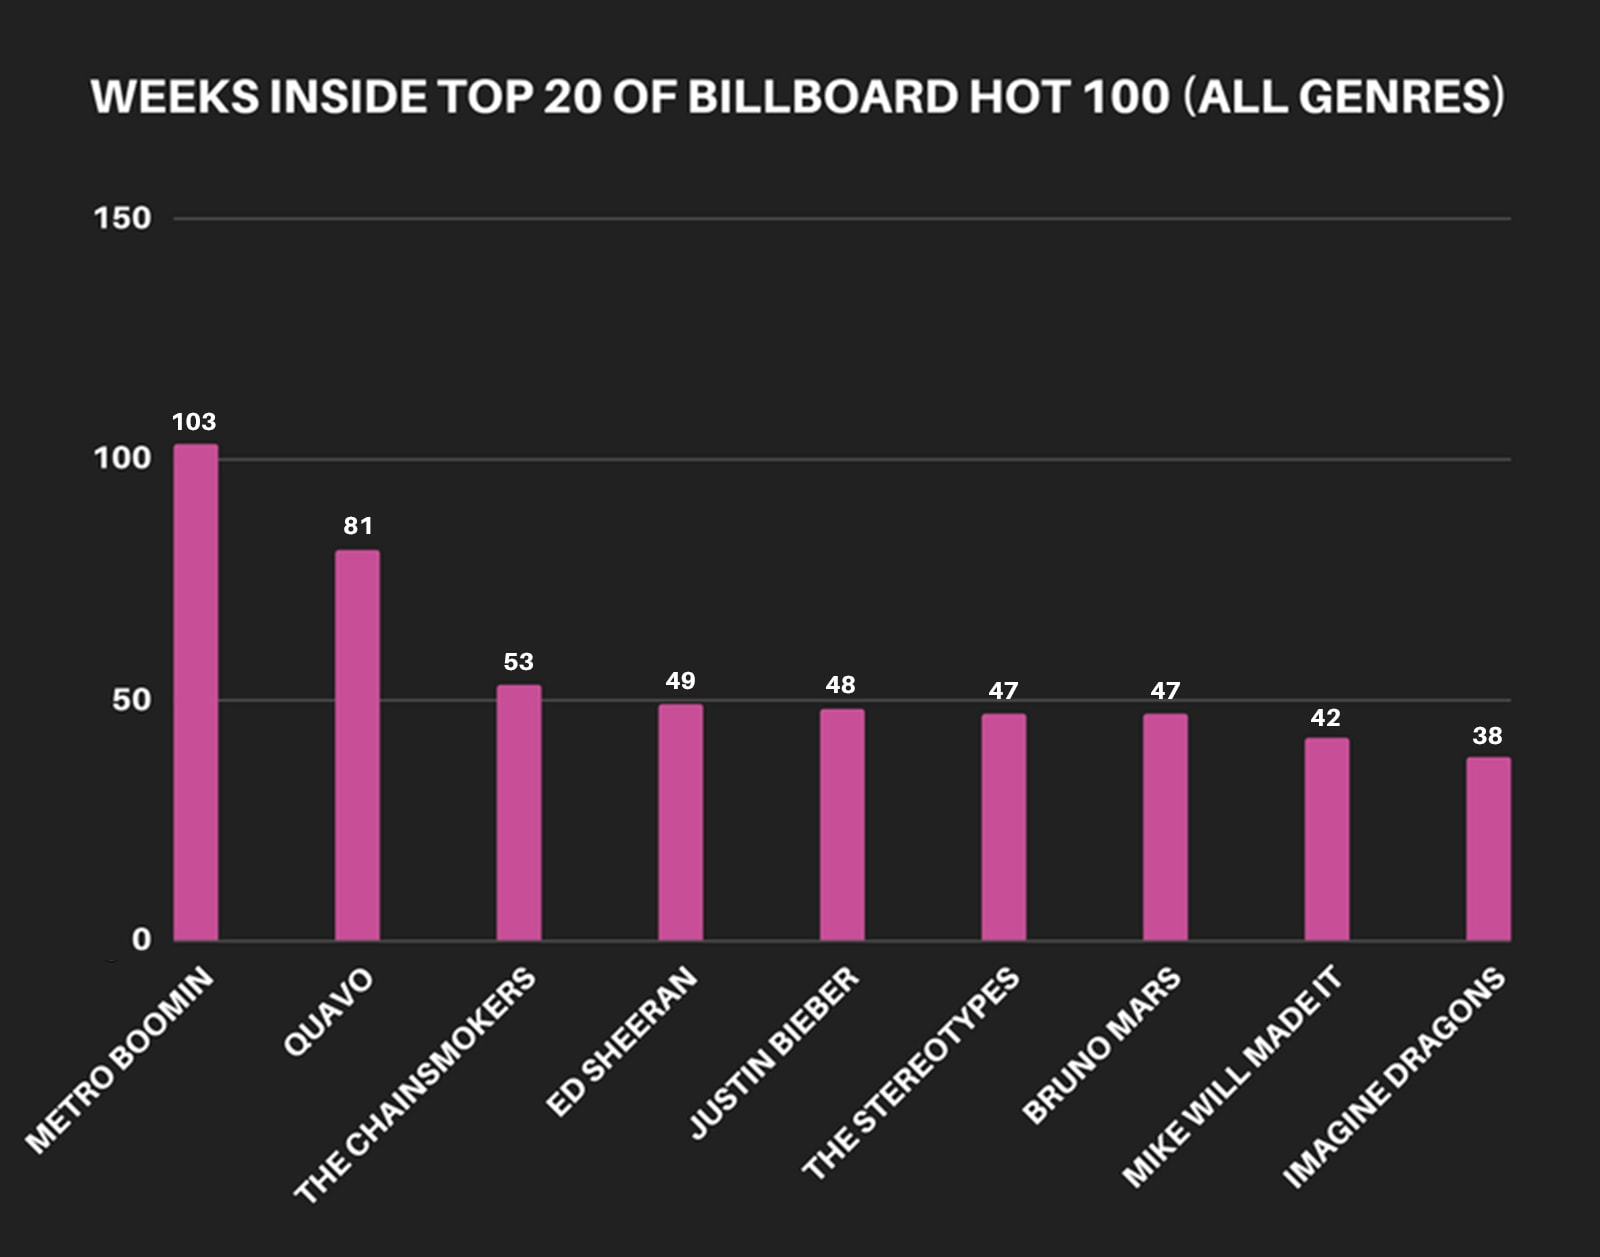 3-2017-producers-weeks-inside-top-20-all-genres-update